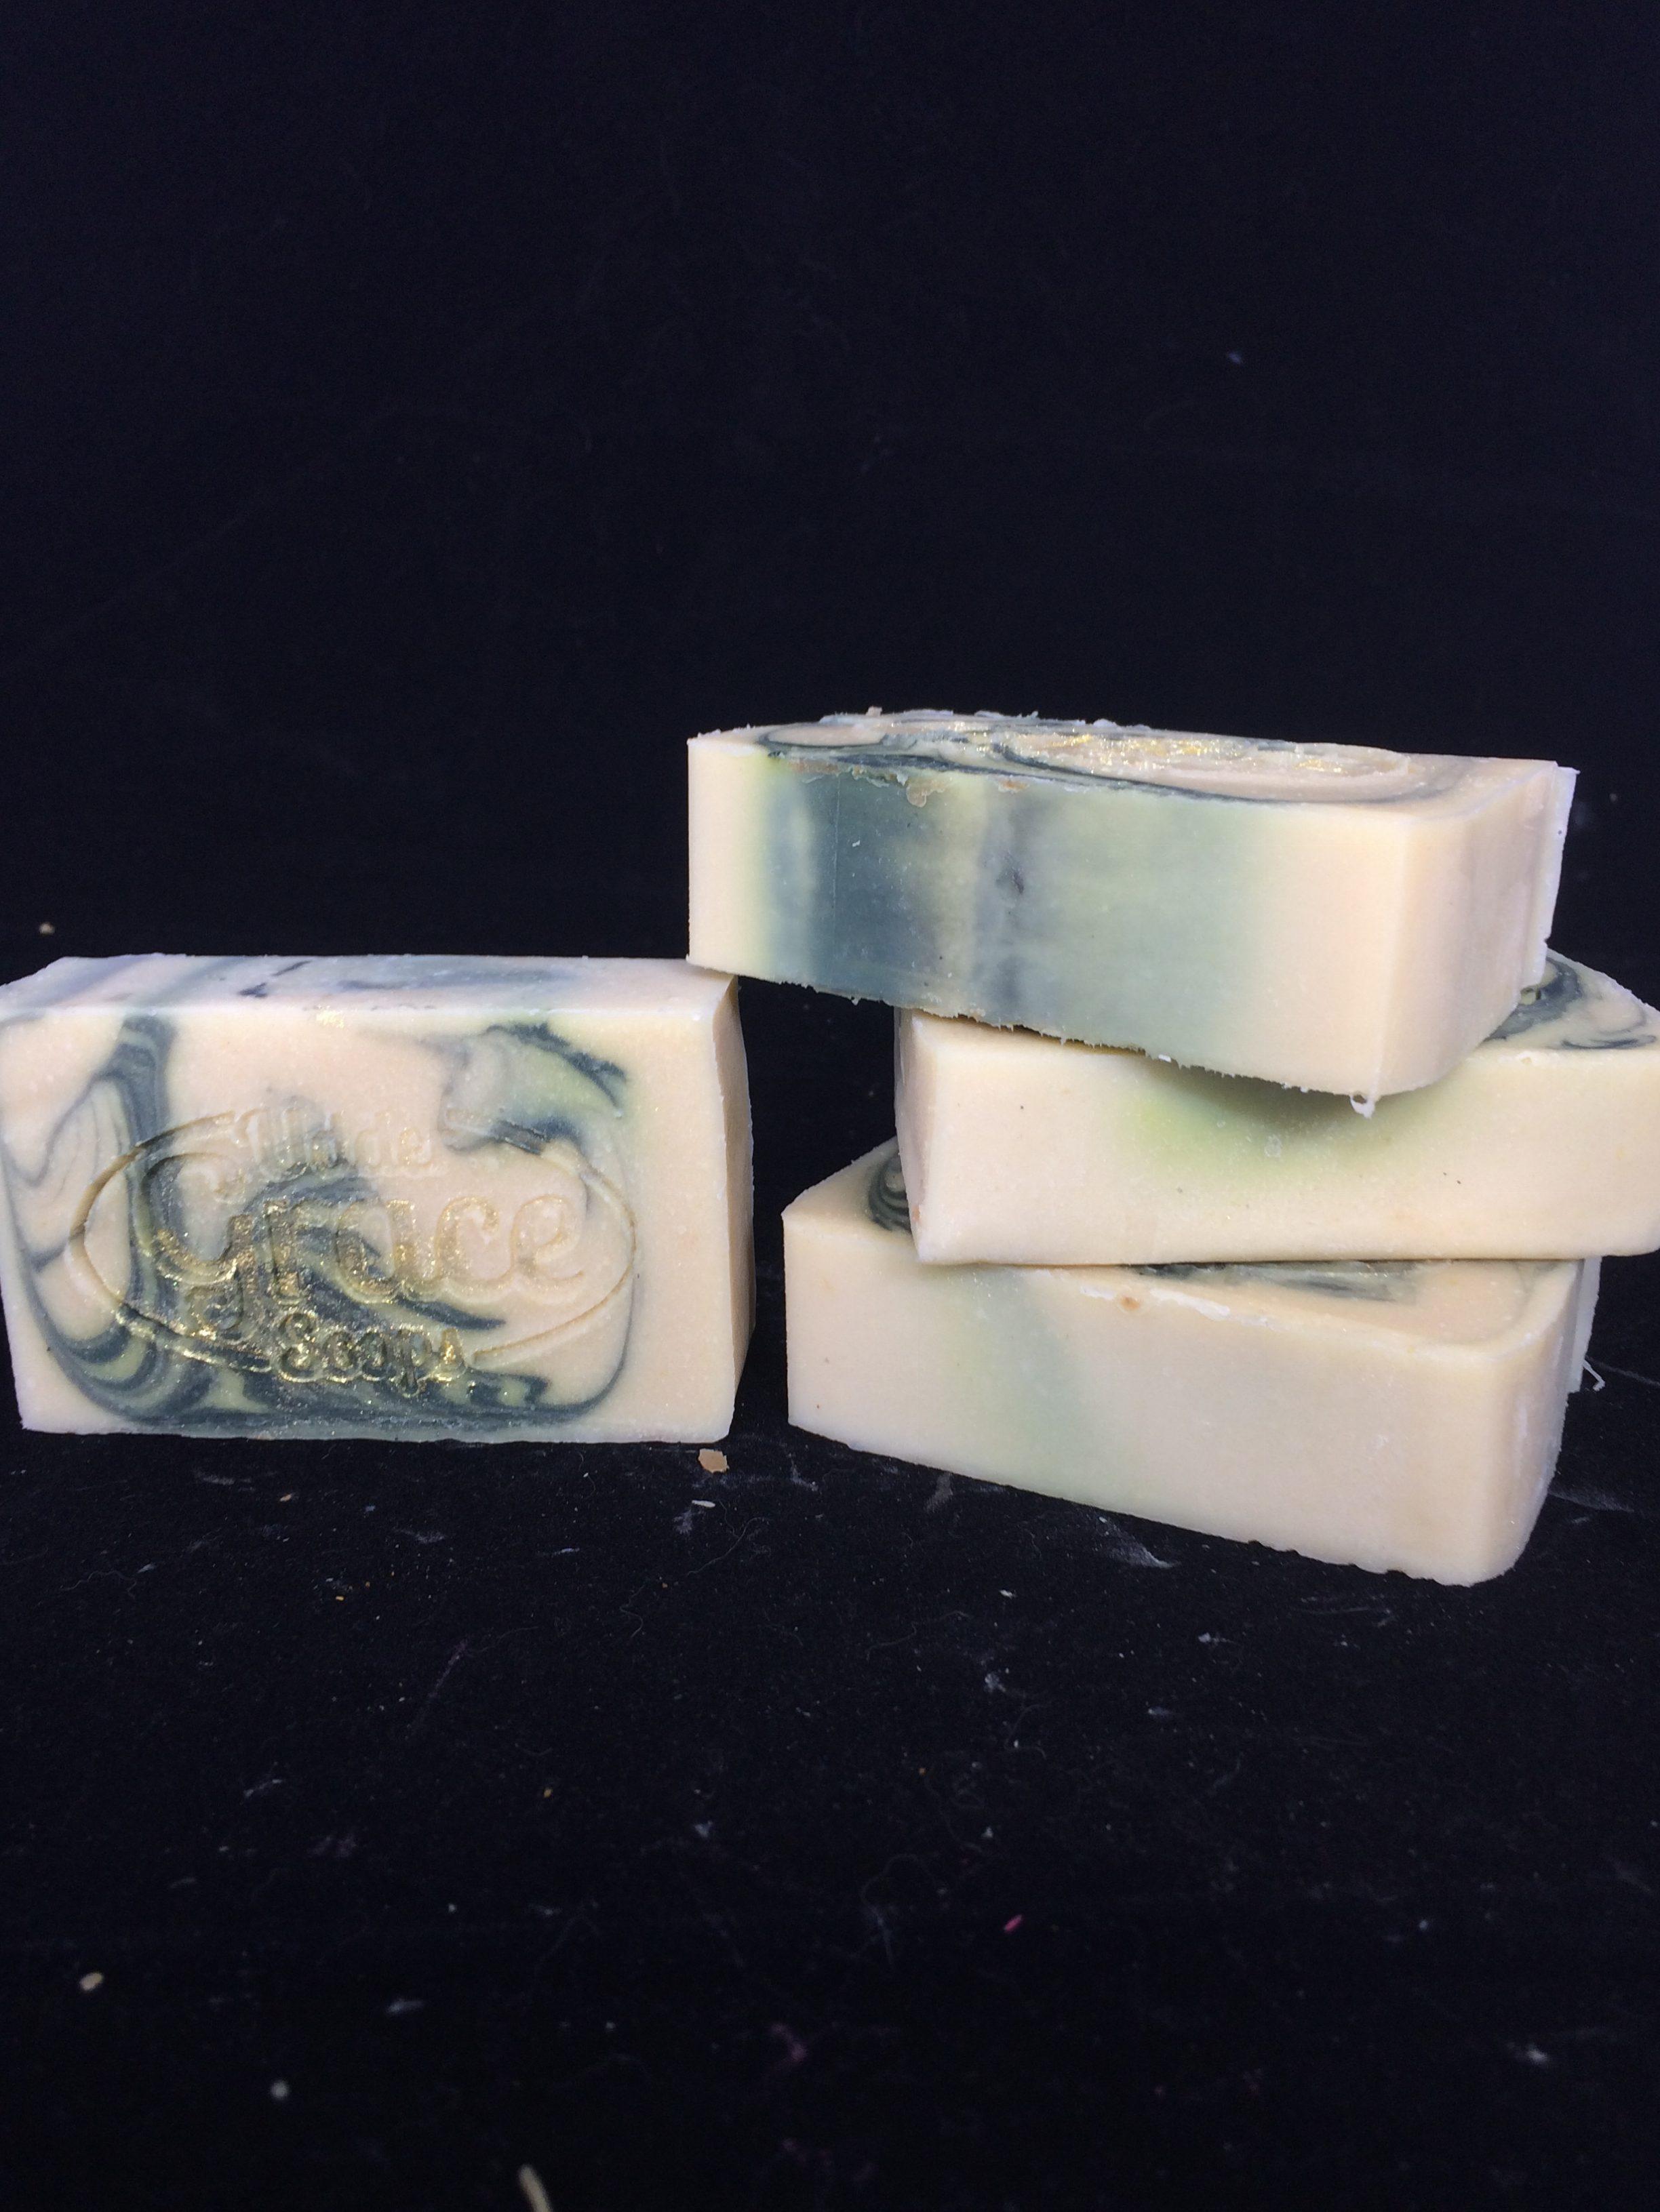 Winter Wonderland handmade soap with goat milk